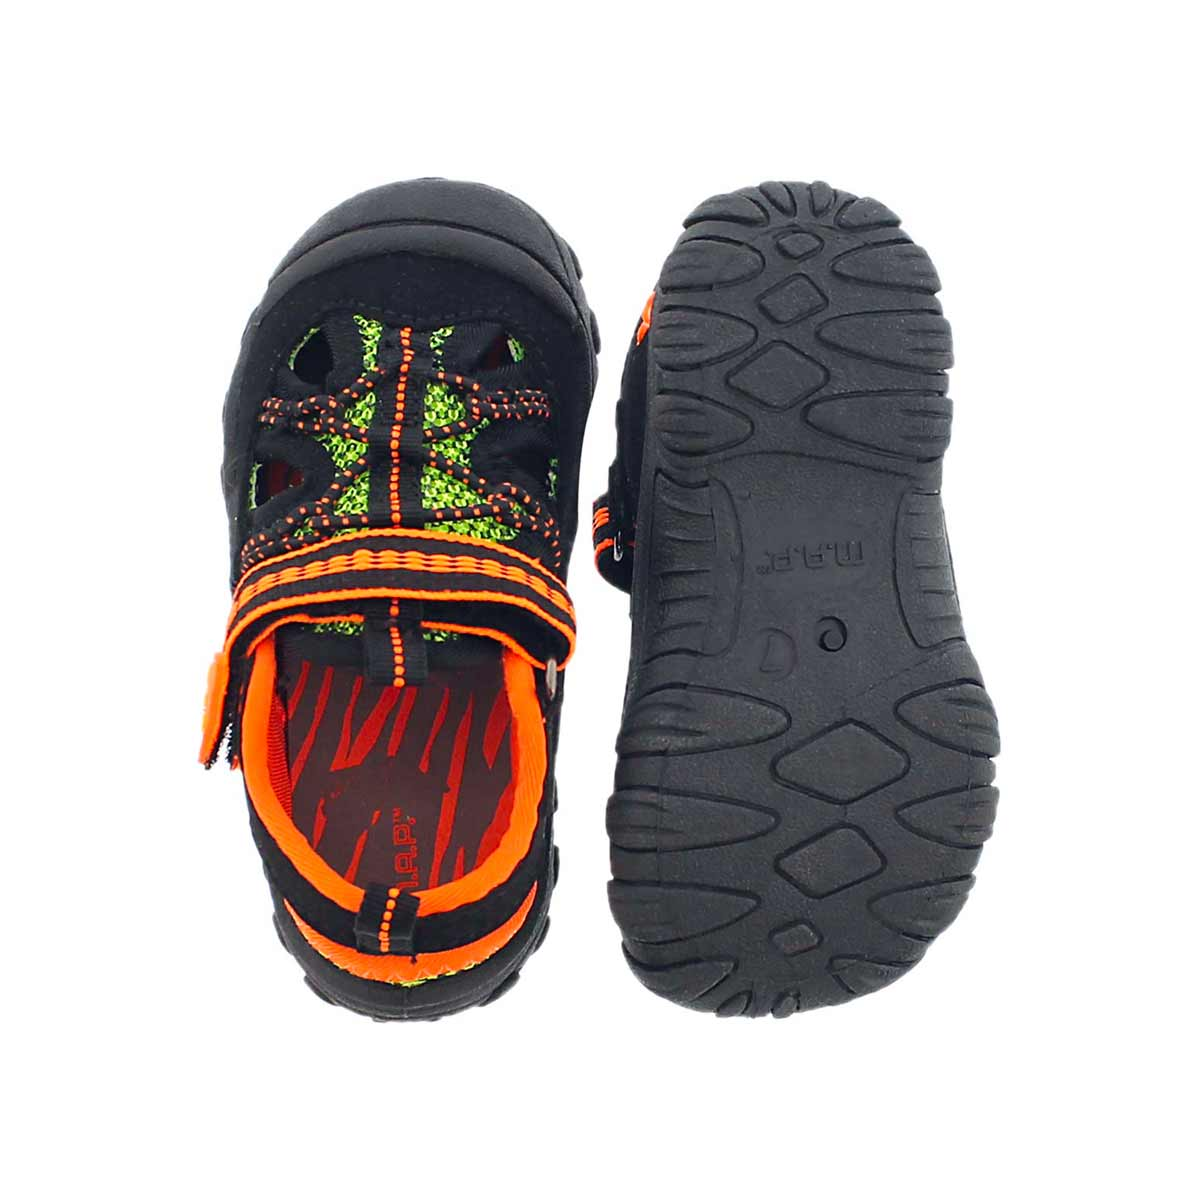 Inf Emmons blk/org fisherman sandal